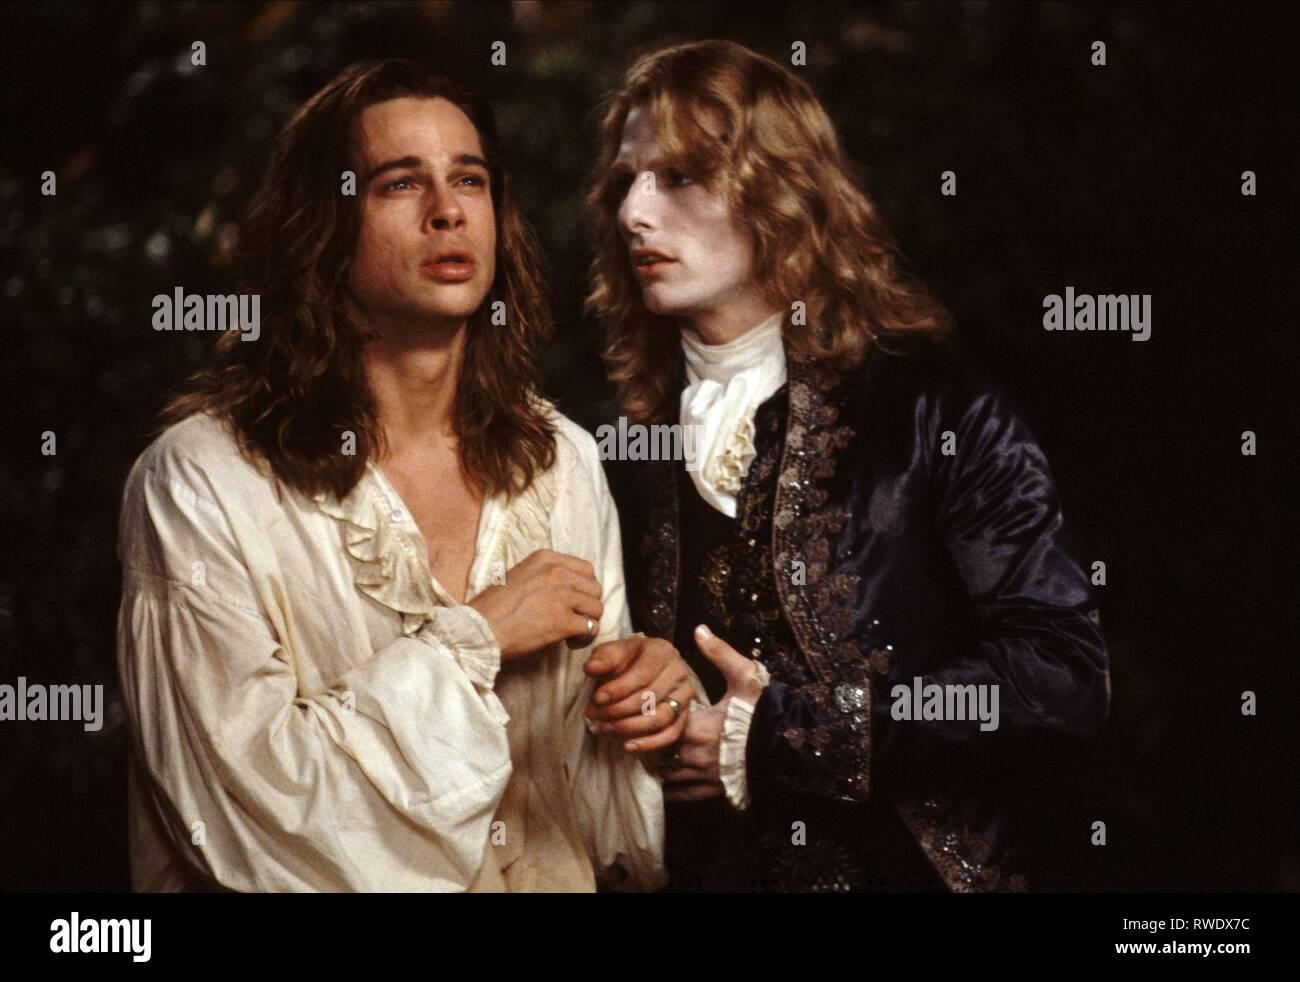 Pitt Cruise Interview With The Vampire The Vampire Chronicles 1994 Stock Photo Alamy